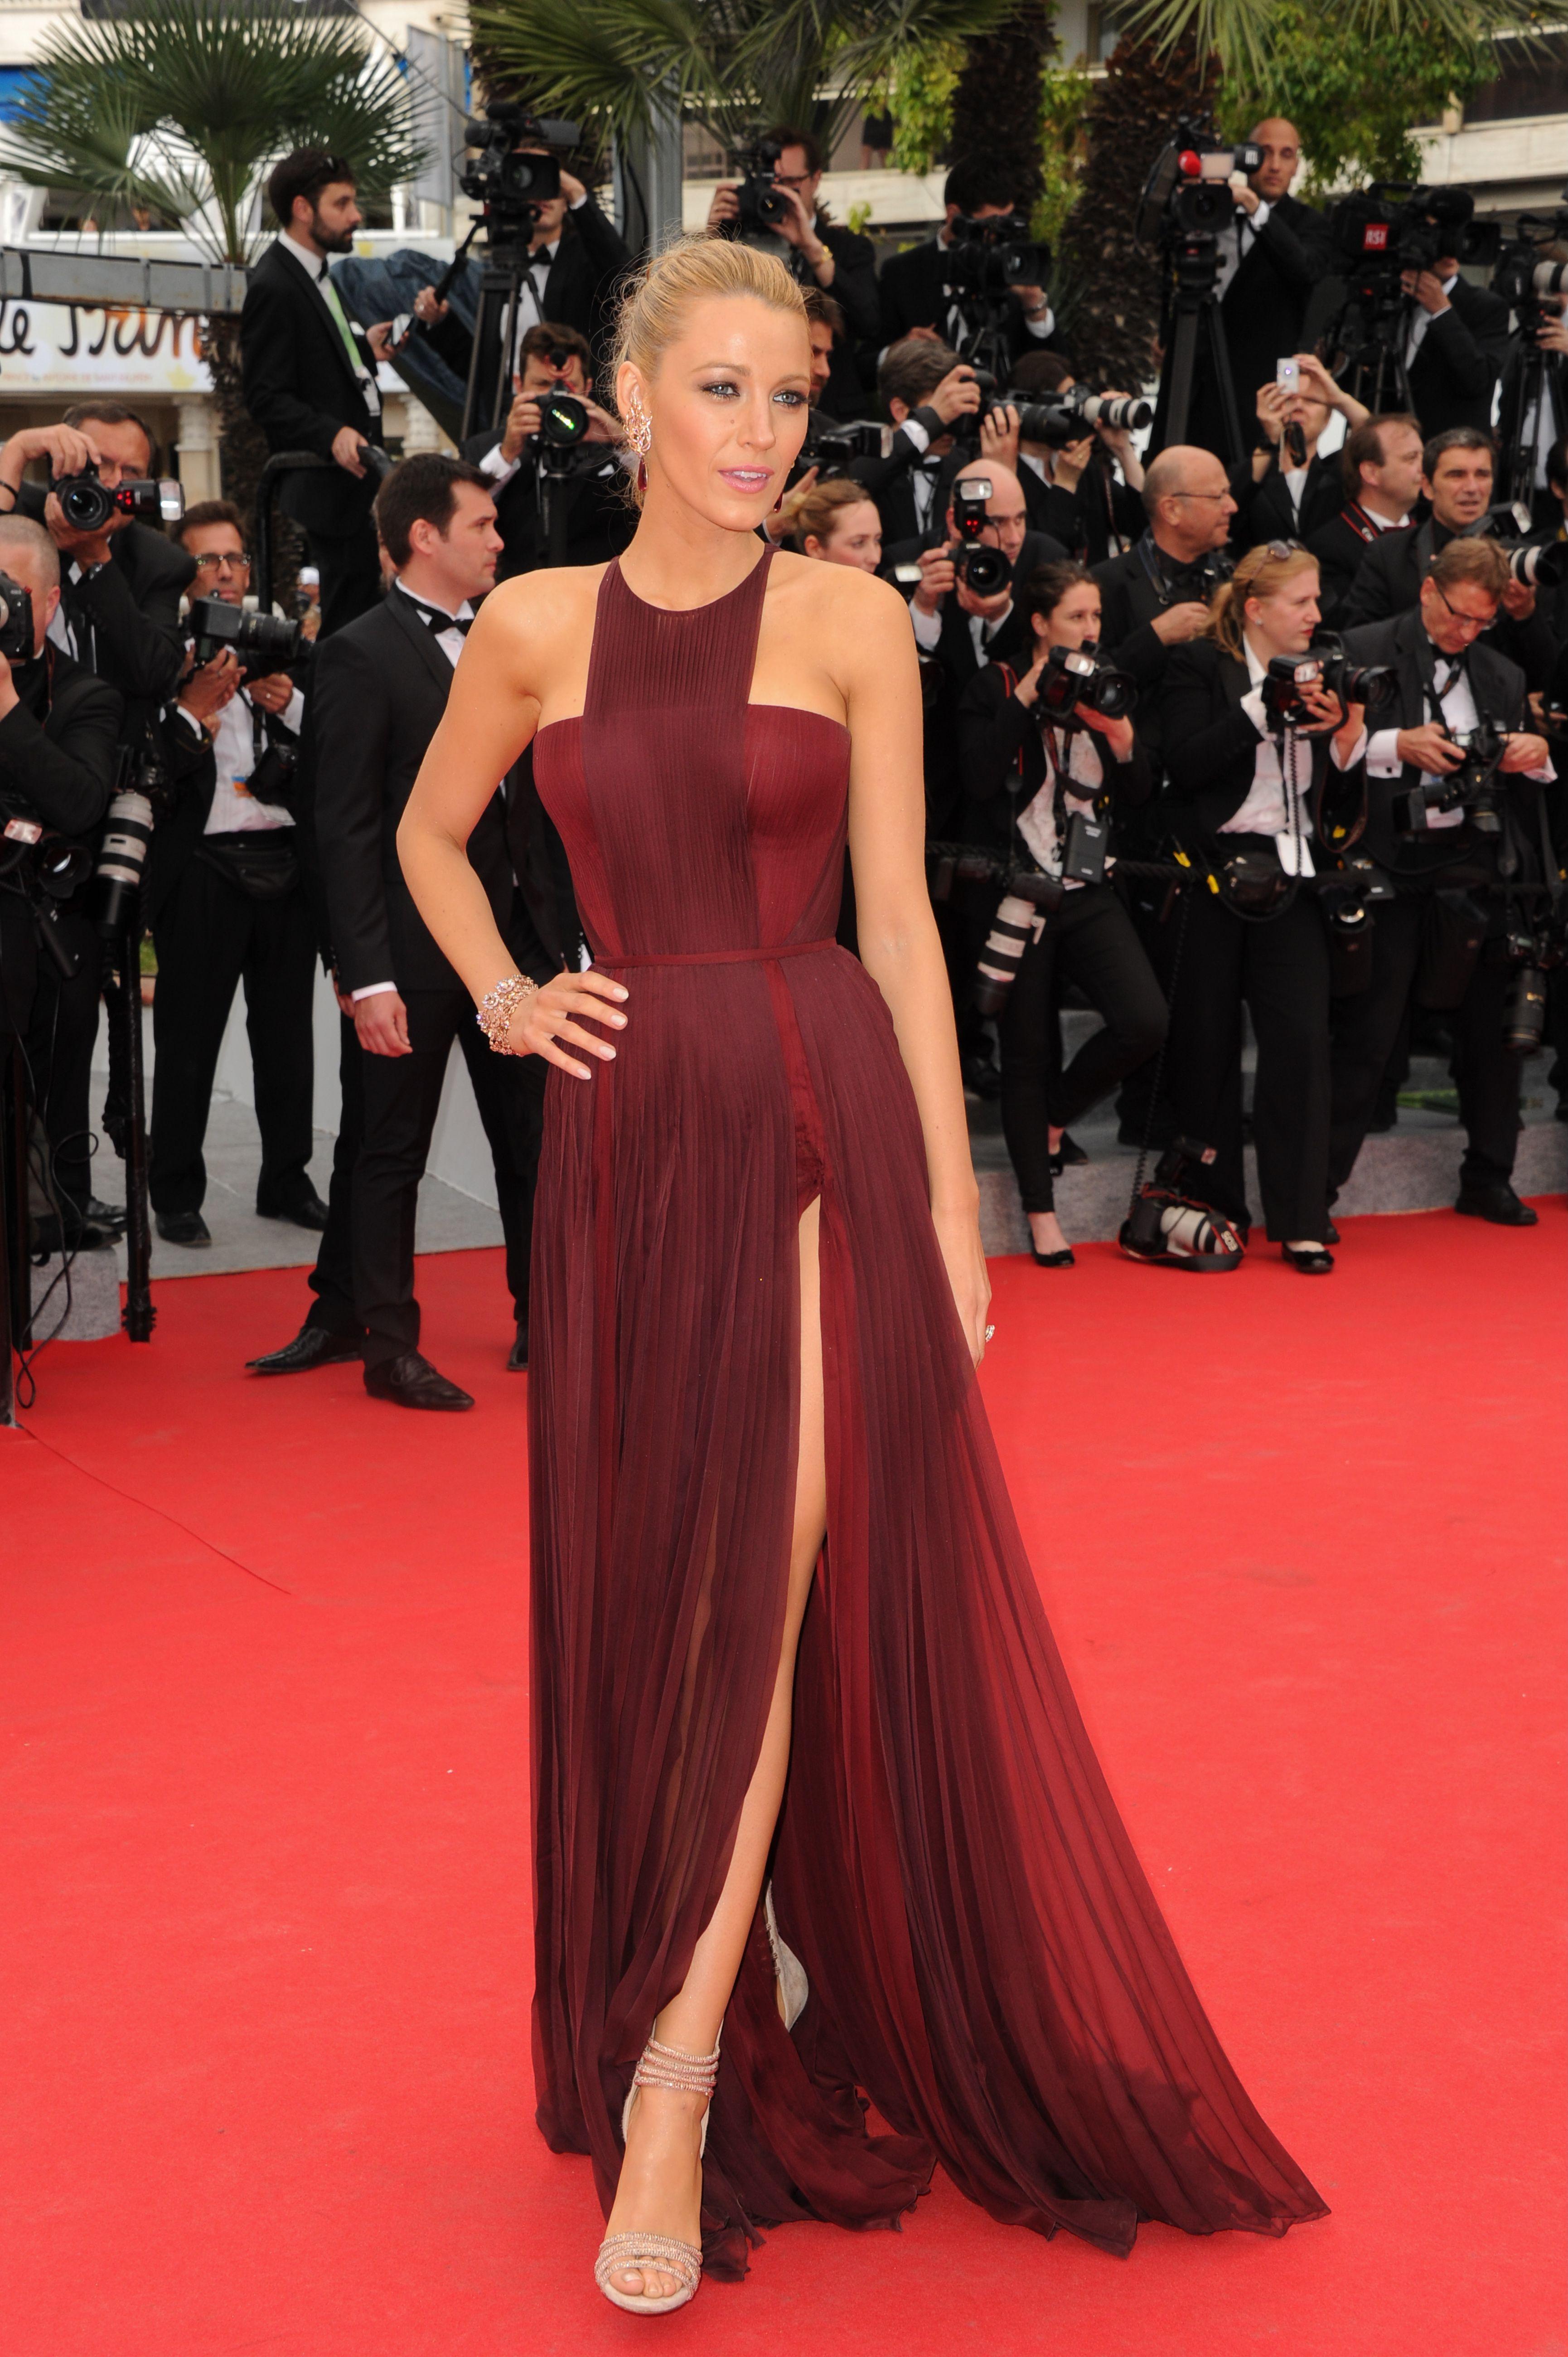 Blake Lively wearing Burgundy Chiffon Evening Dress, Beige ...